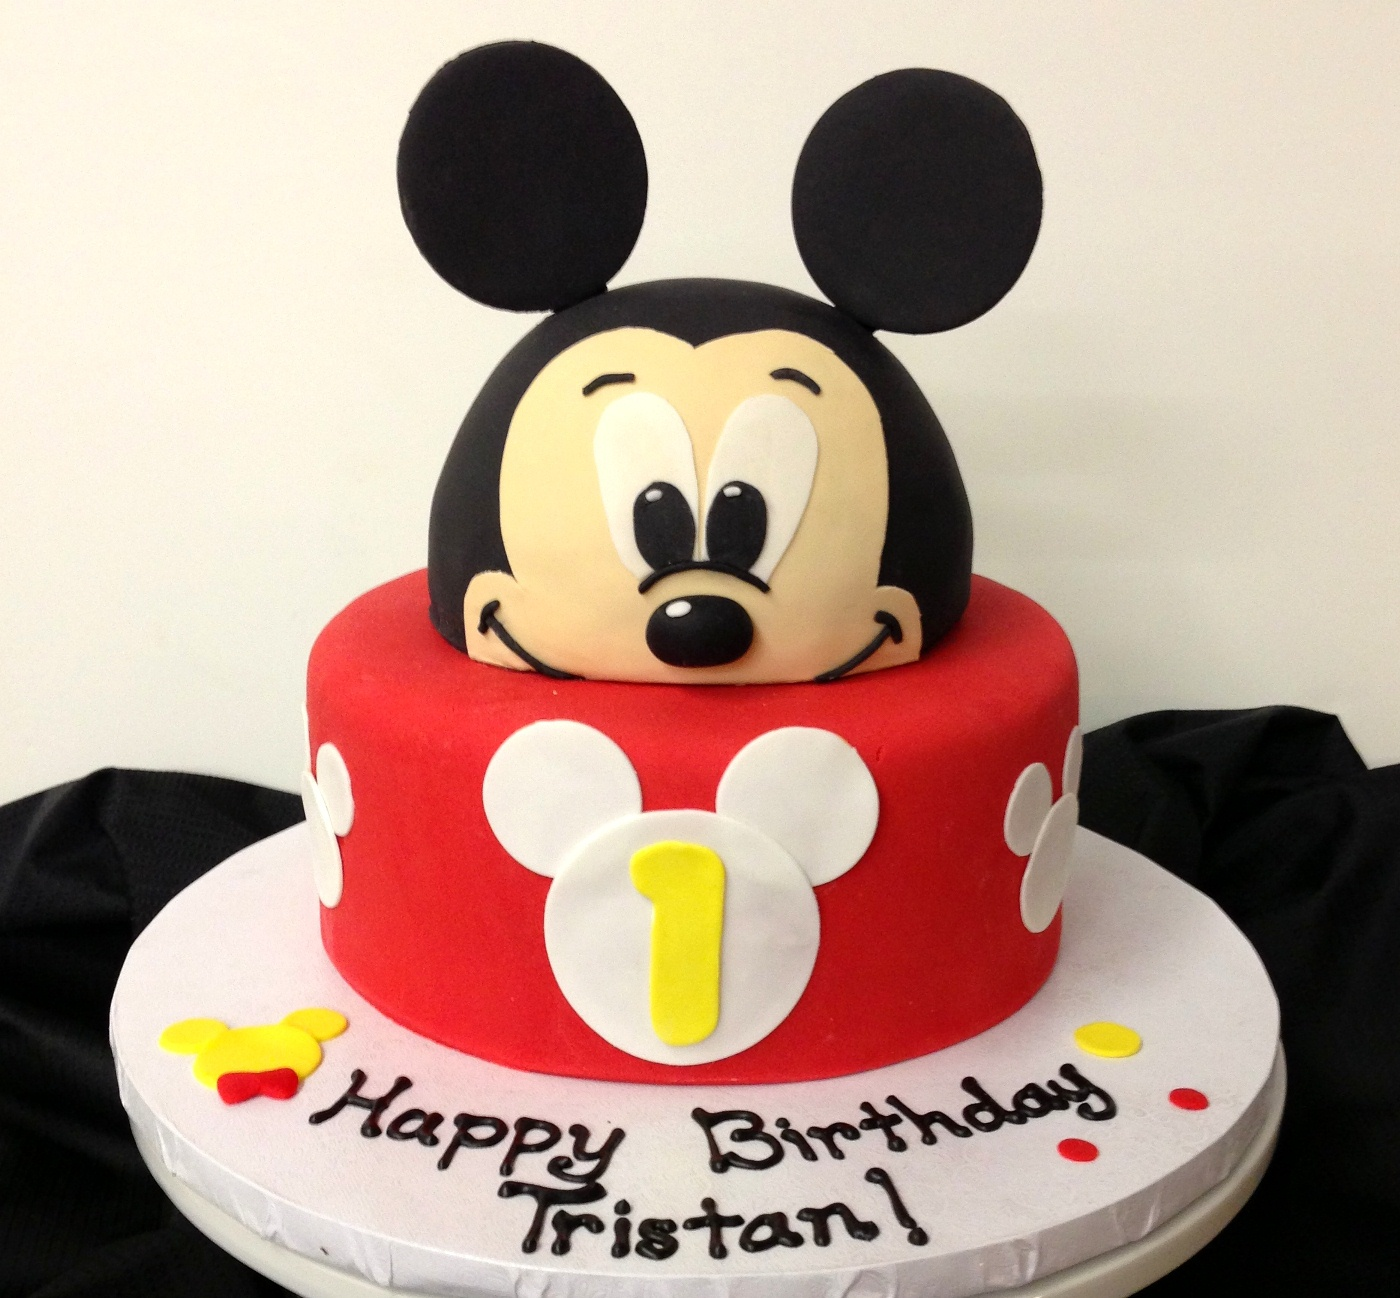 Cartoon cakes (3)